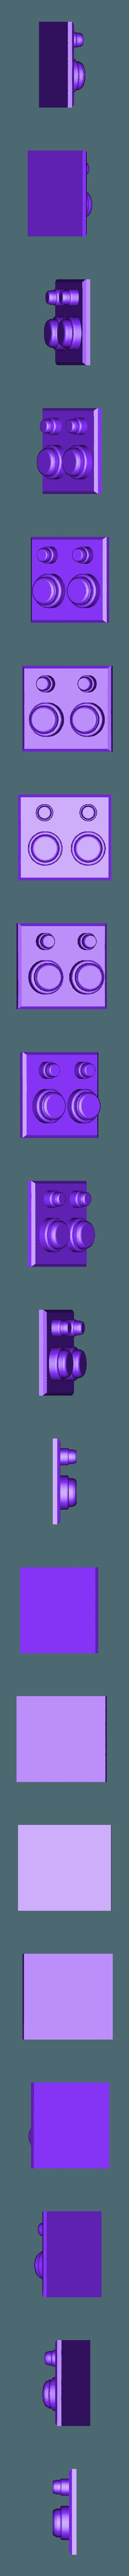 side_buttons_1.stl Download free STL file ORCA communicator (Godzilla) • 3D printing object, poblocki1982